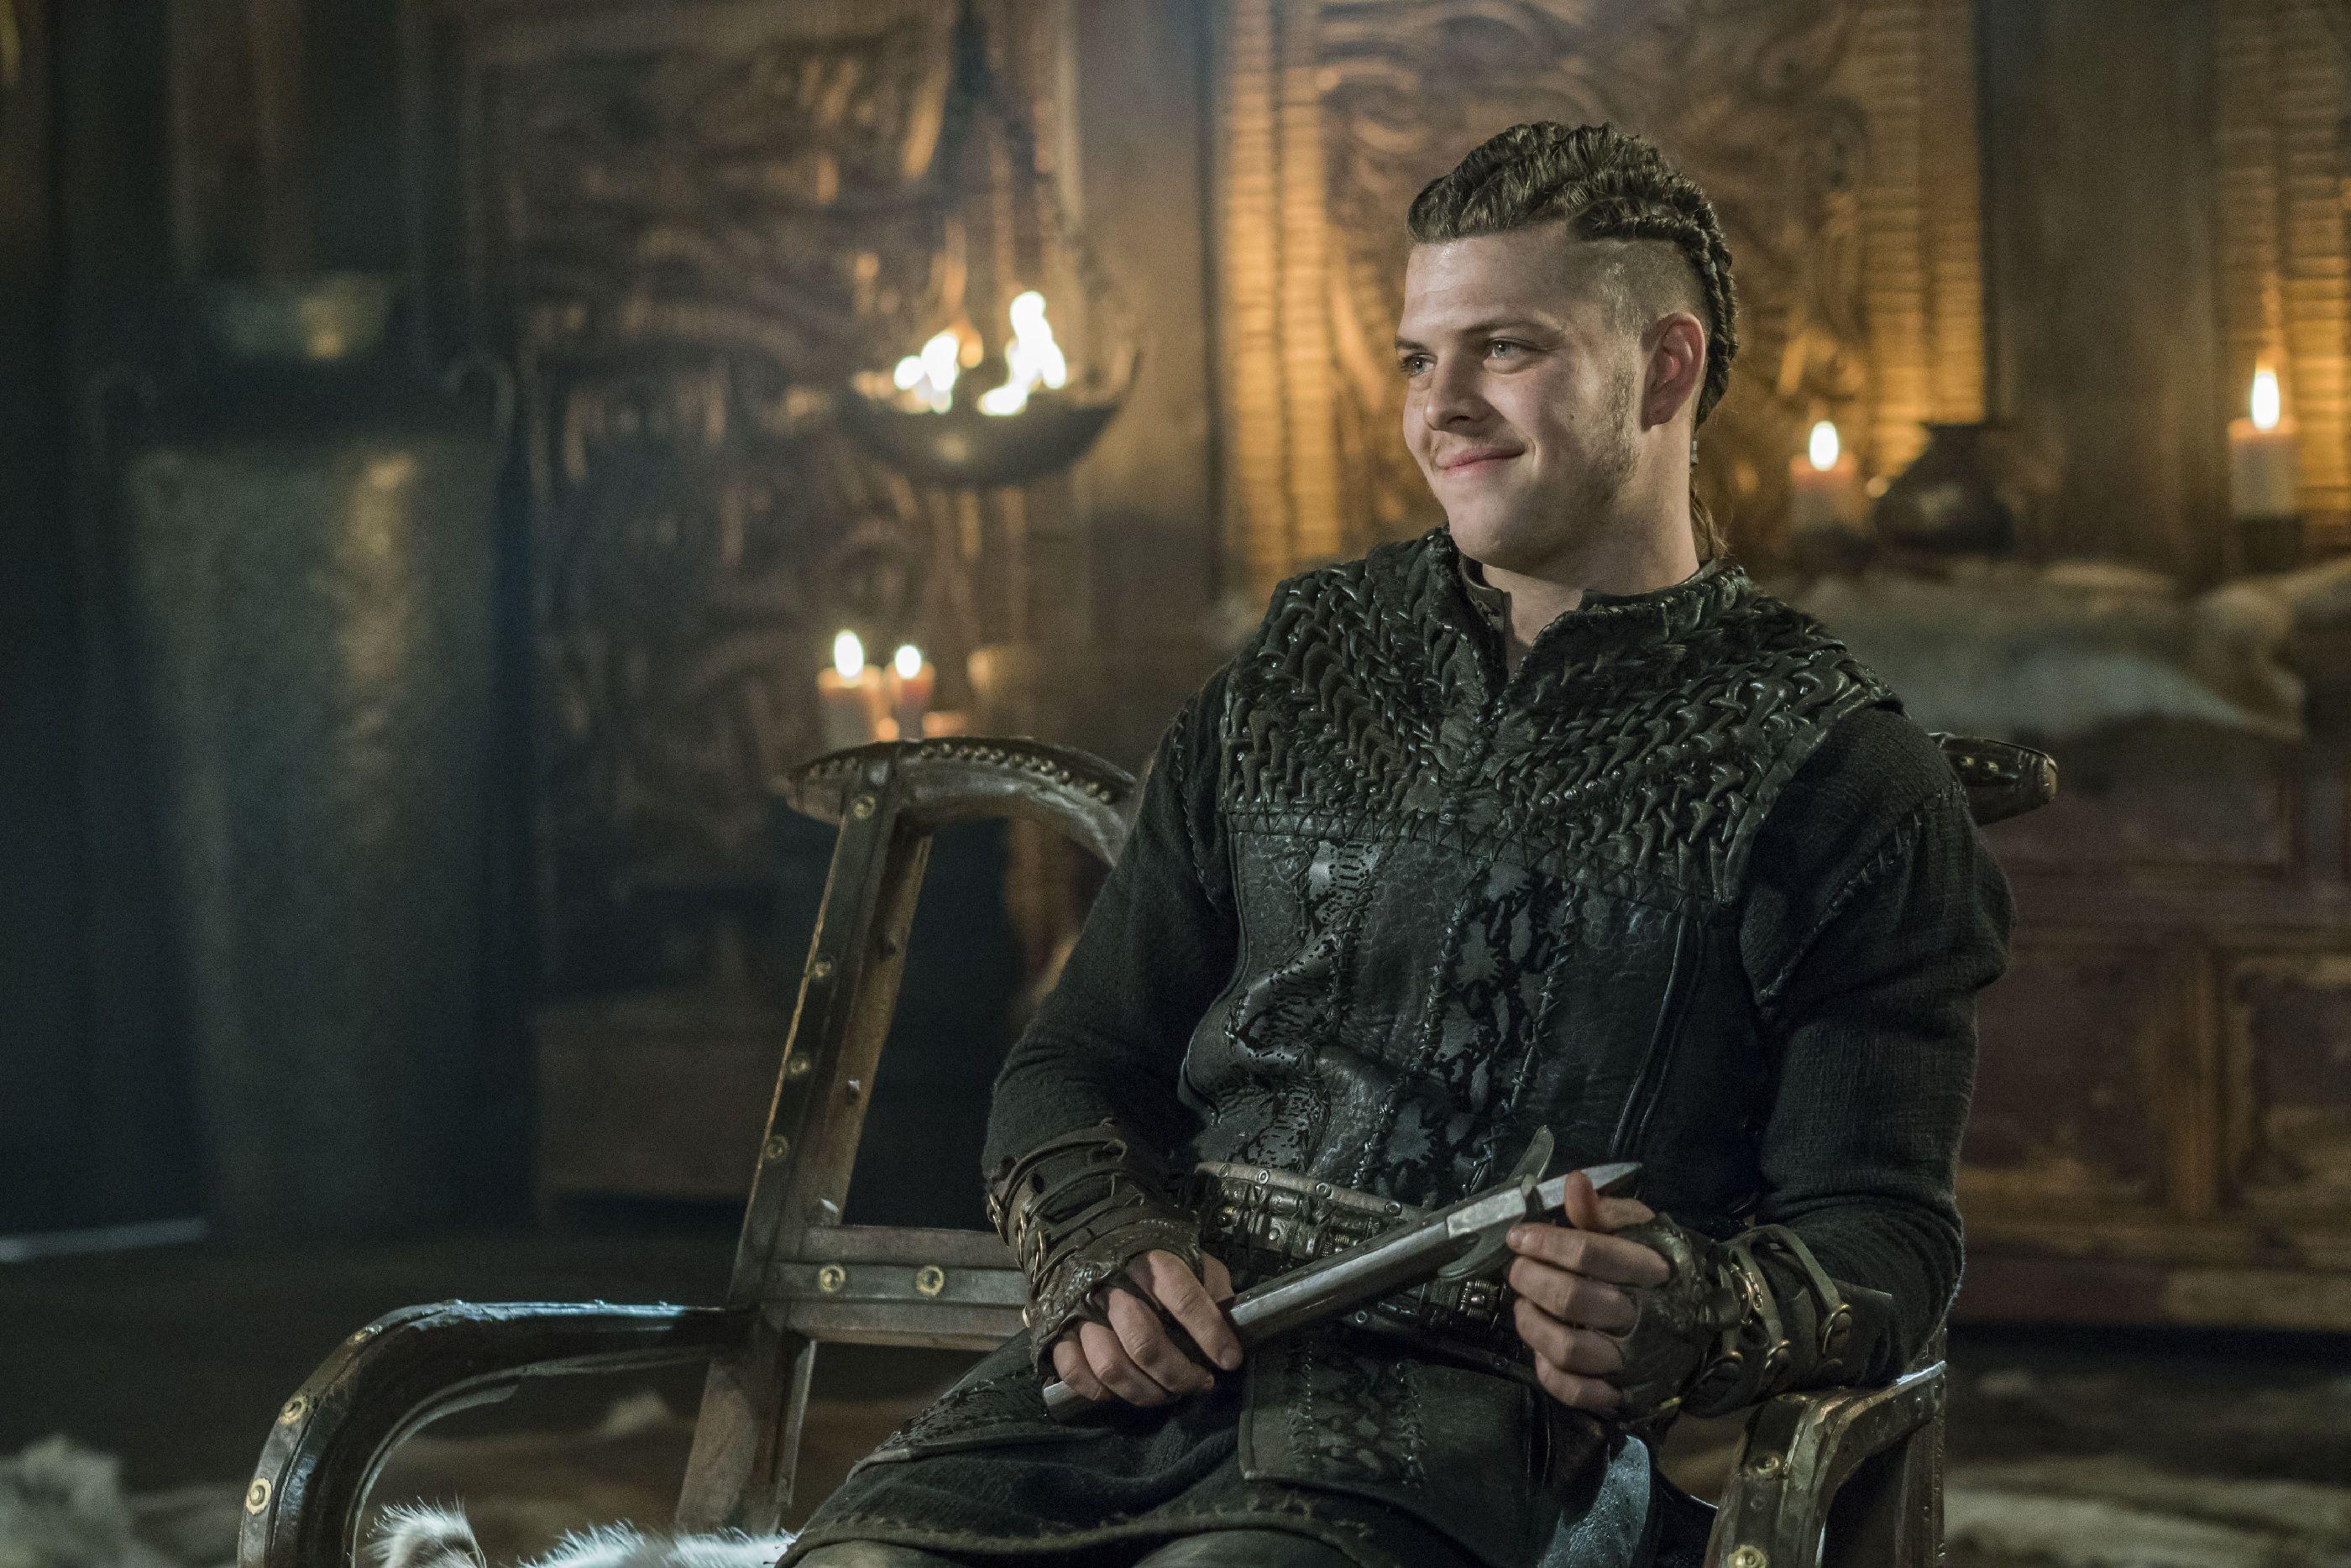 Vikings star hints at shock return for season 6